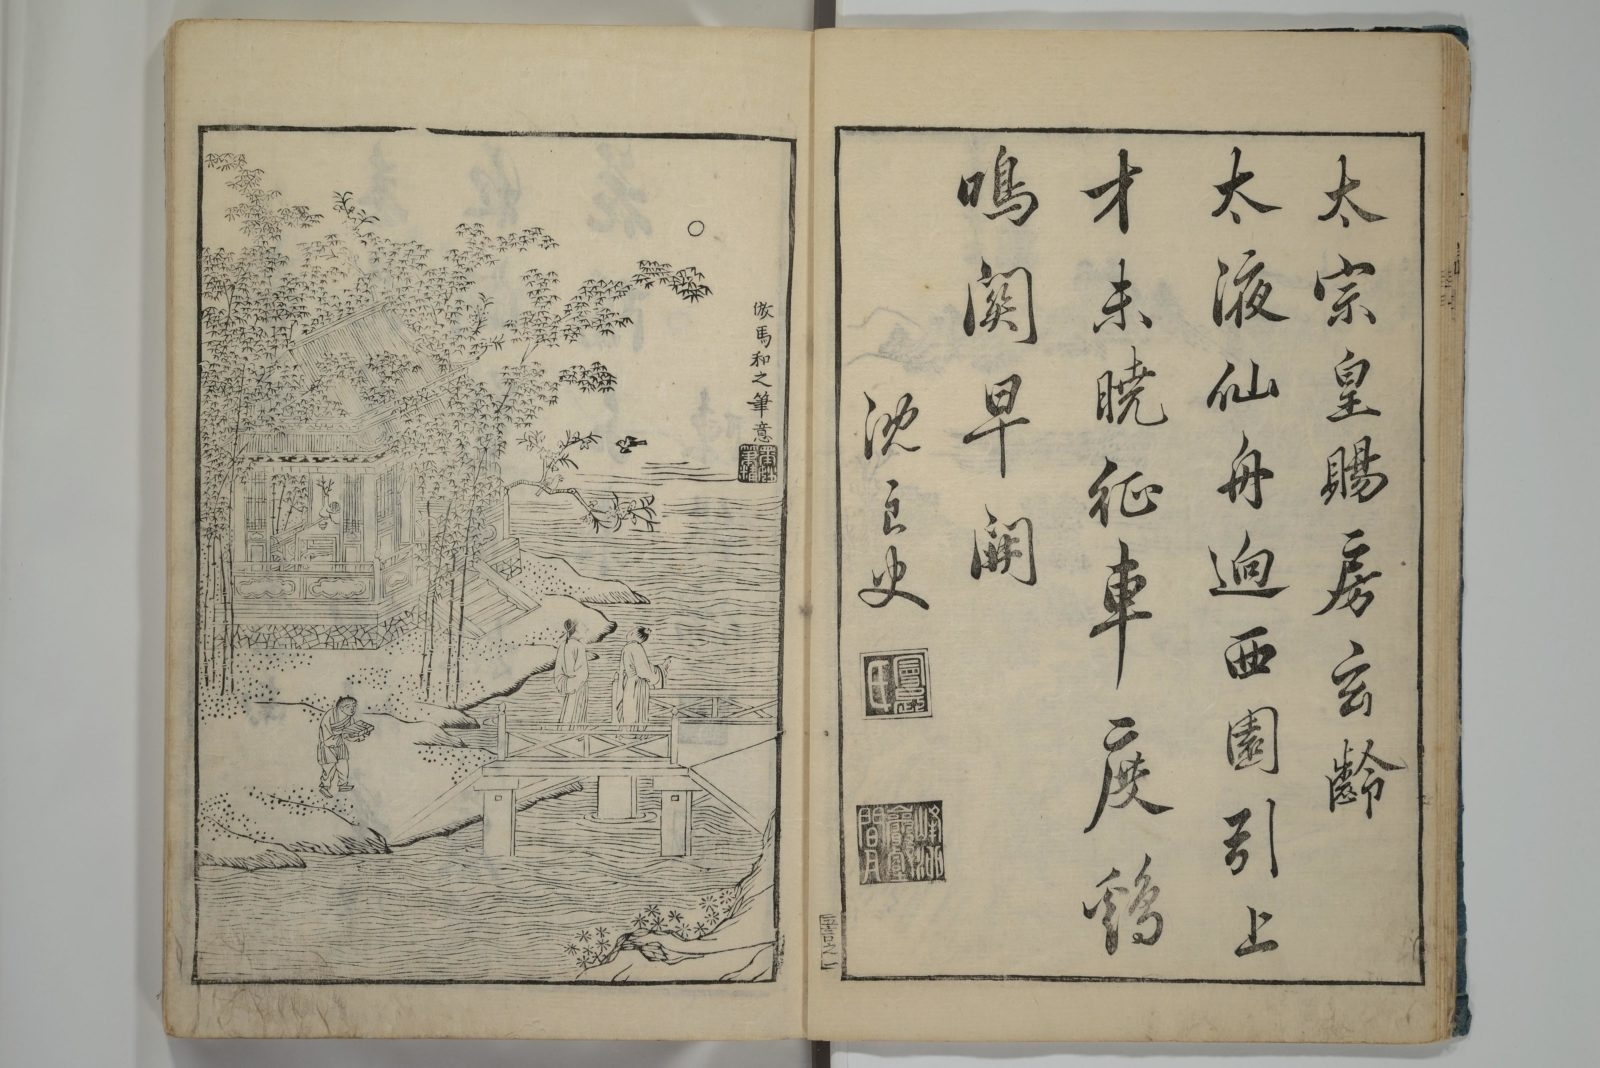 Primer on Eight Varieties of Painting (Hasshu gafu)